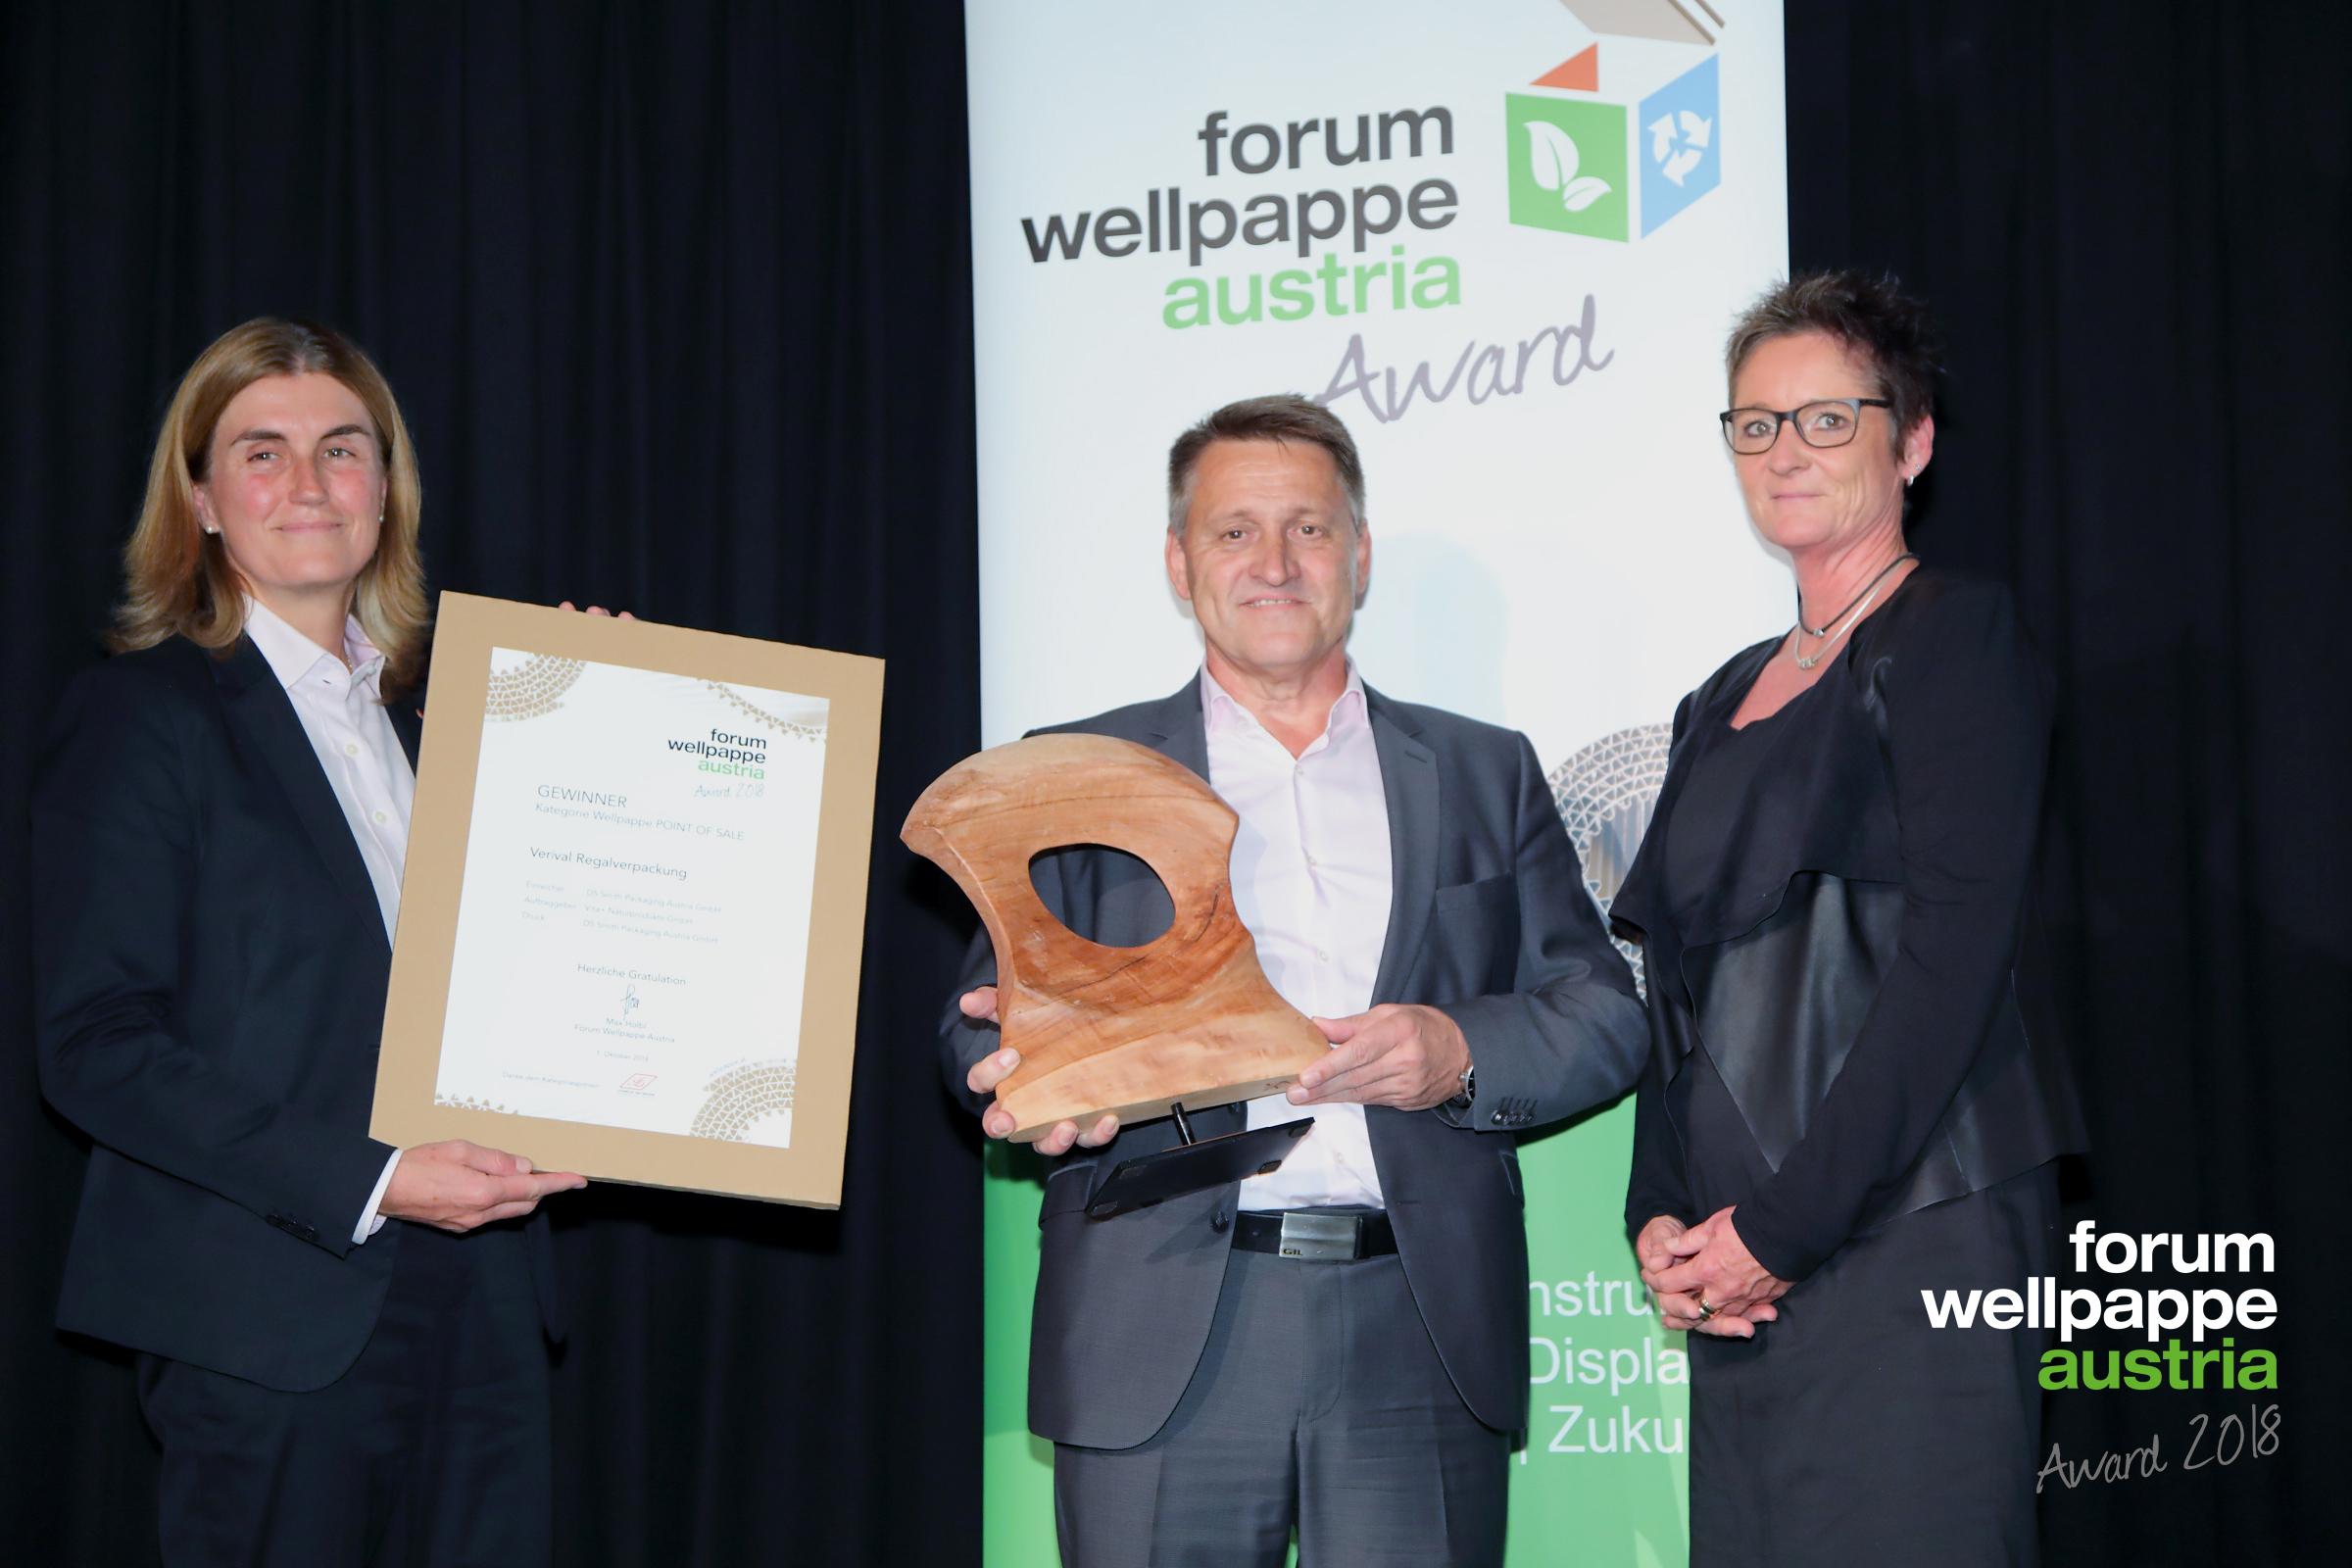 WELLPAPPE AWARD 2018 C. Gadenstätter DS Smith, E. Steinwender DS Smith, C. Klampfl Doneck Euroflex © com_unit/L. SCHEDL